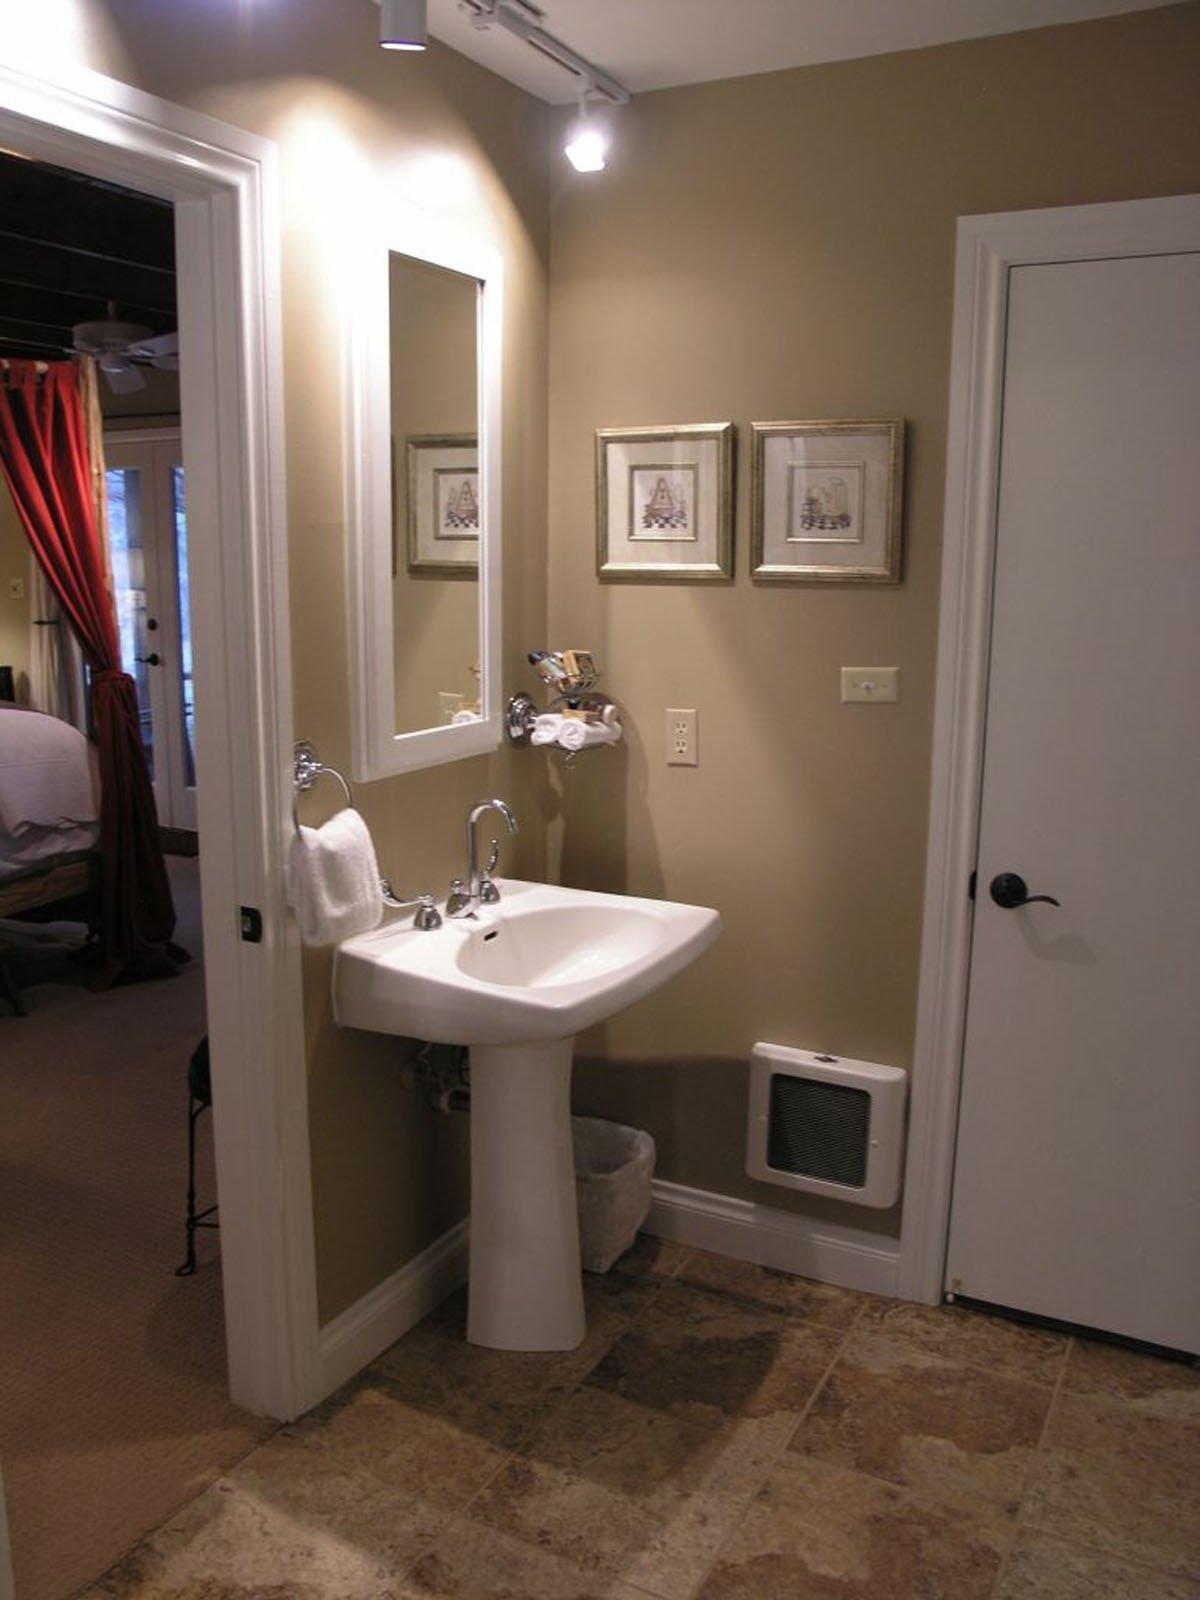 10 Famous Bathroom Color Ideas For Small Bathrooms brilliant bathroom colors for small spaces cute paint ideas for 2020